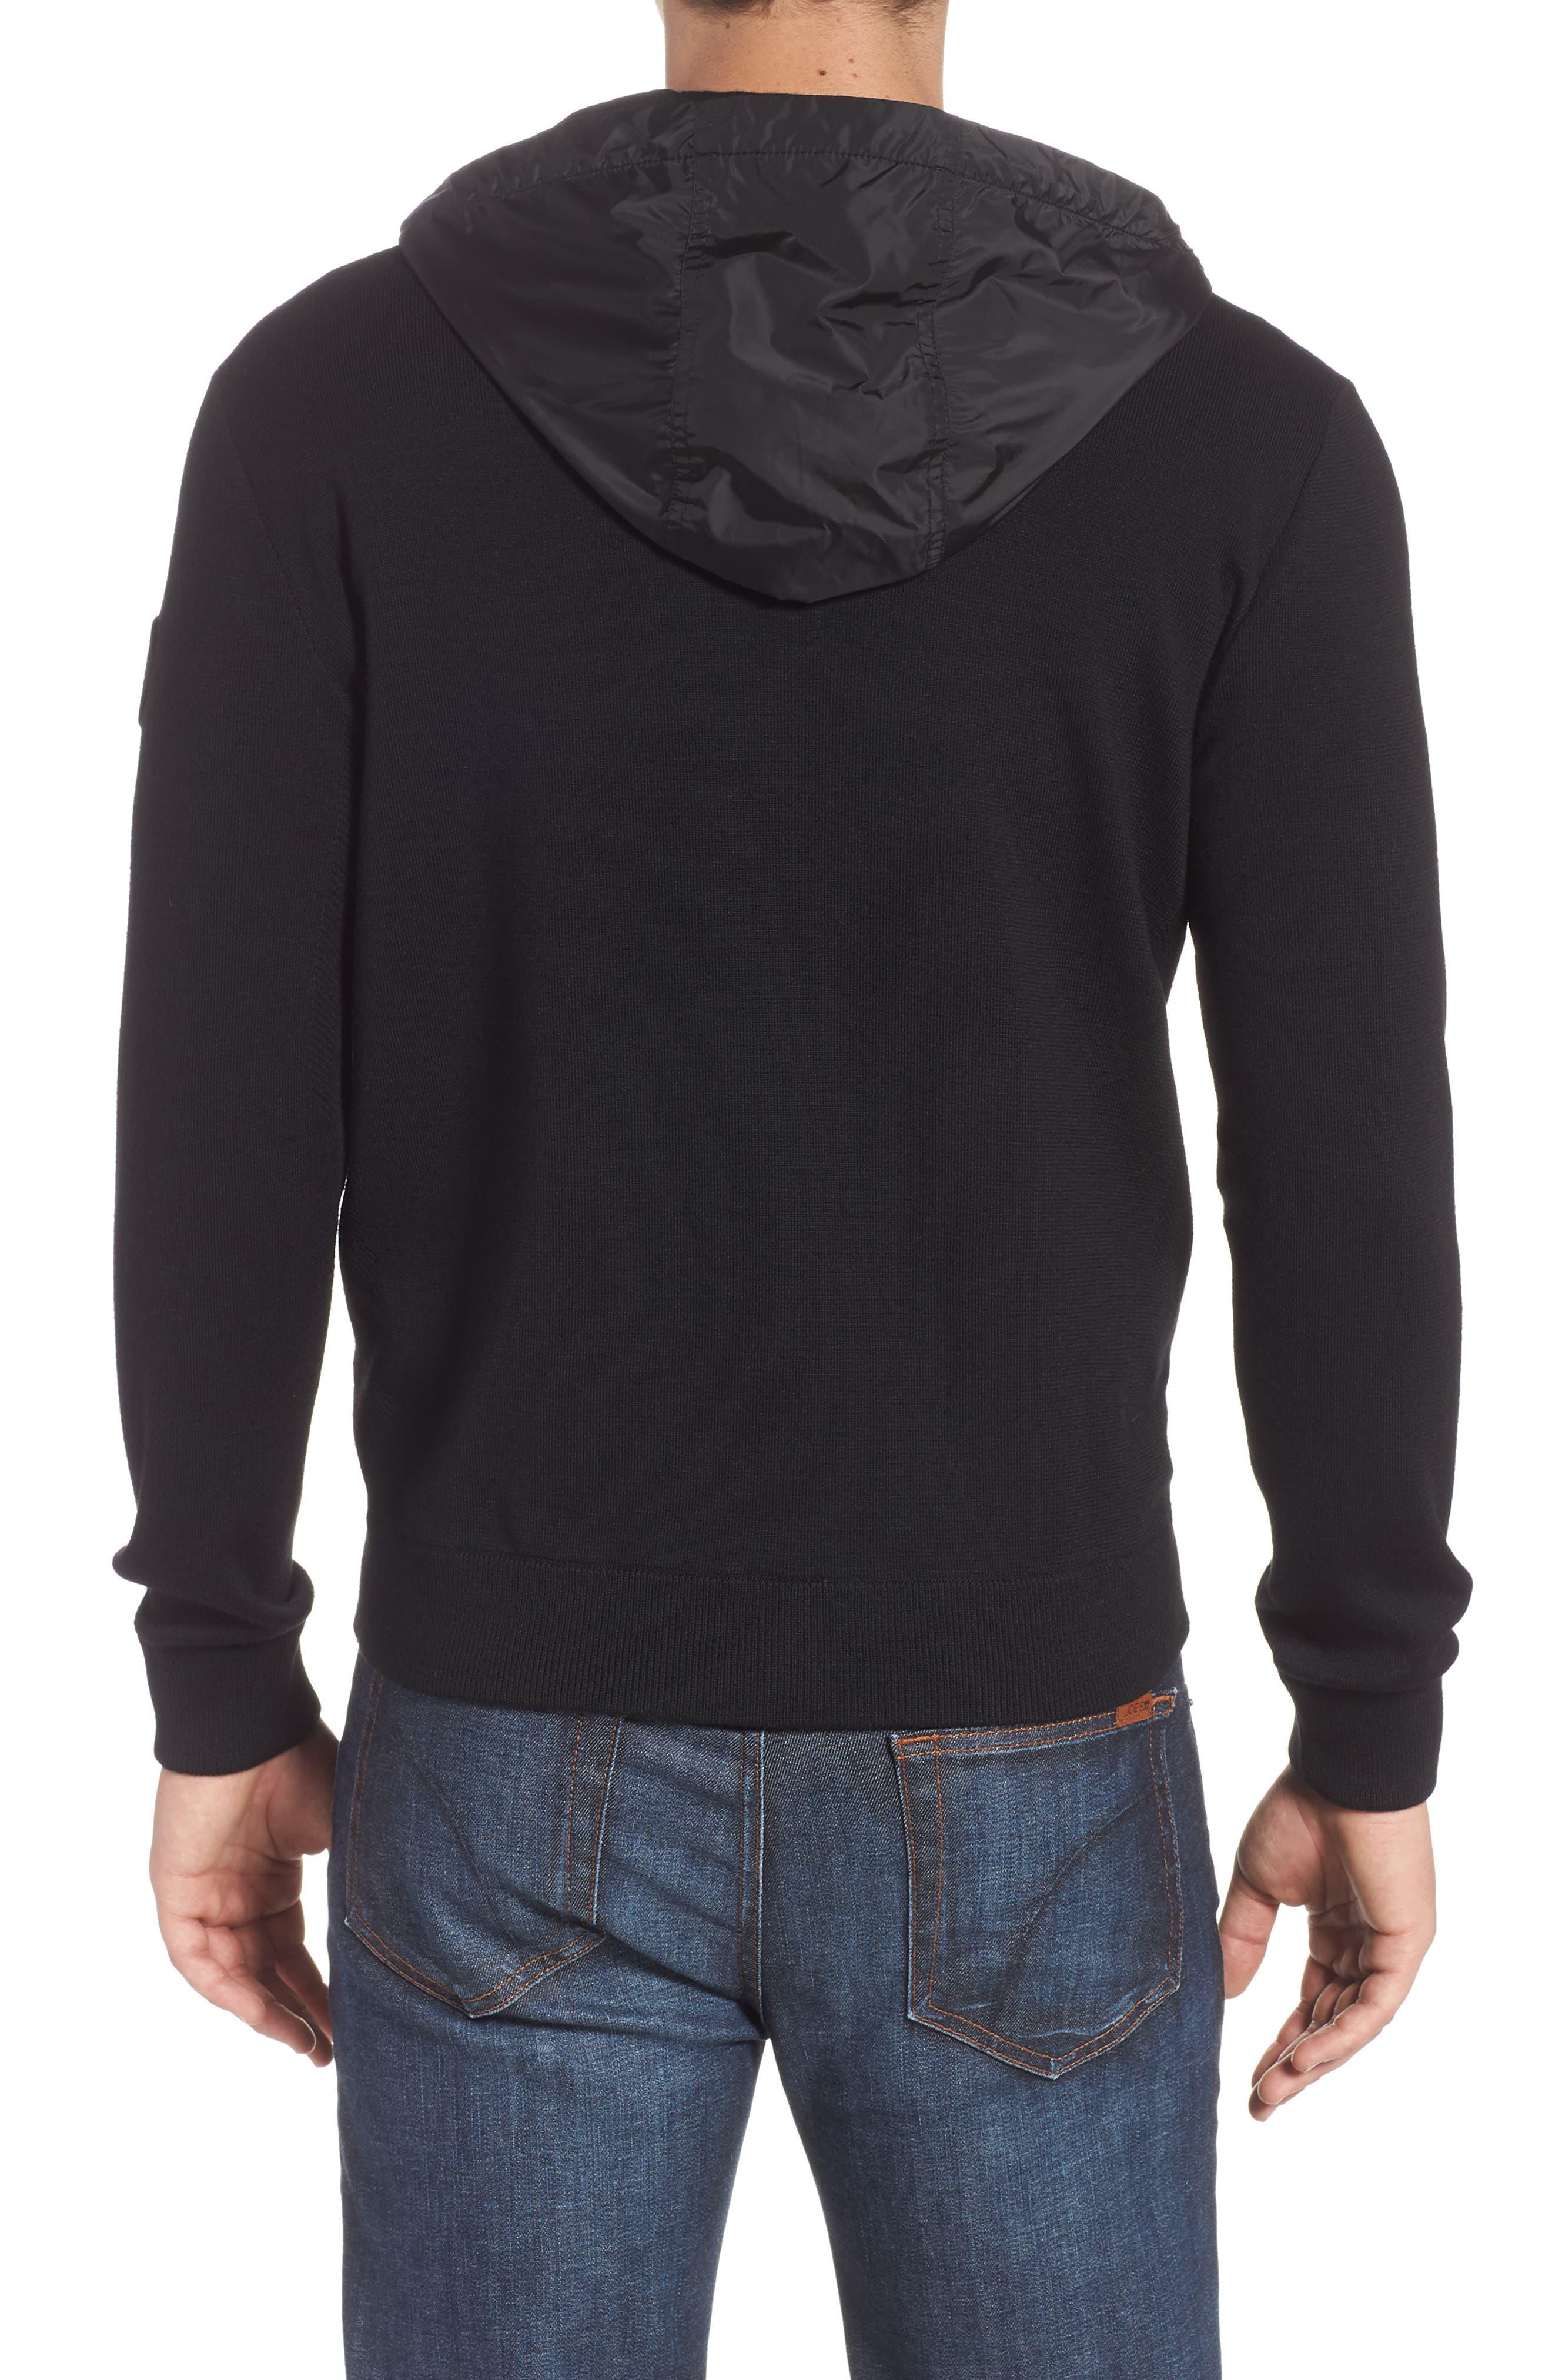 Windbridge Regular Fit Hooded Sweater Jacket,                             Alternate thumbnail 2, color,                             BLACK